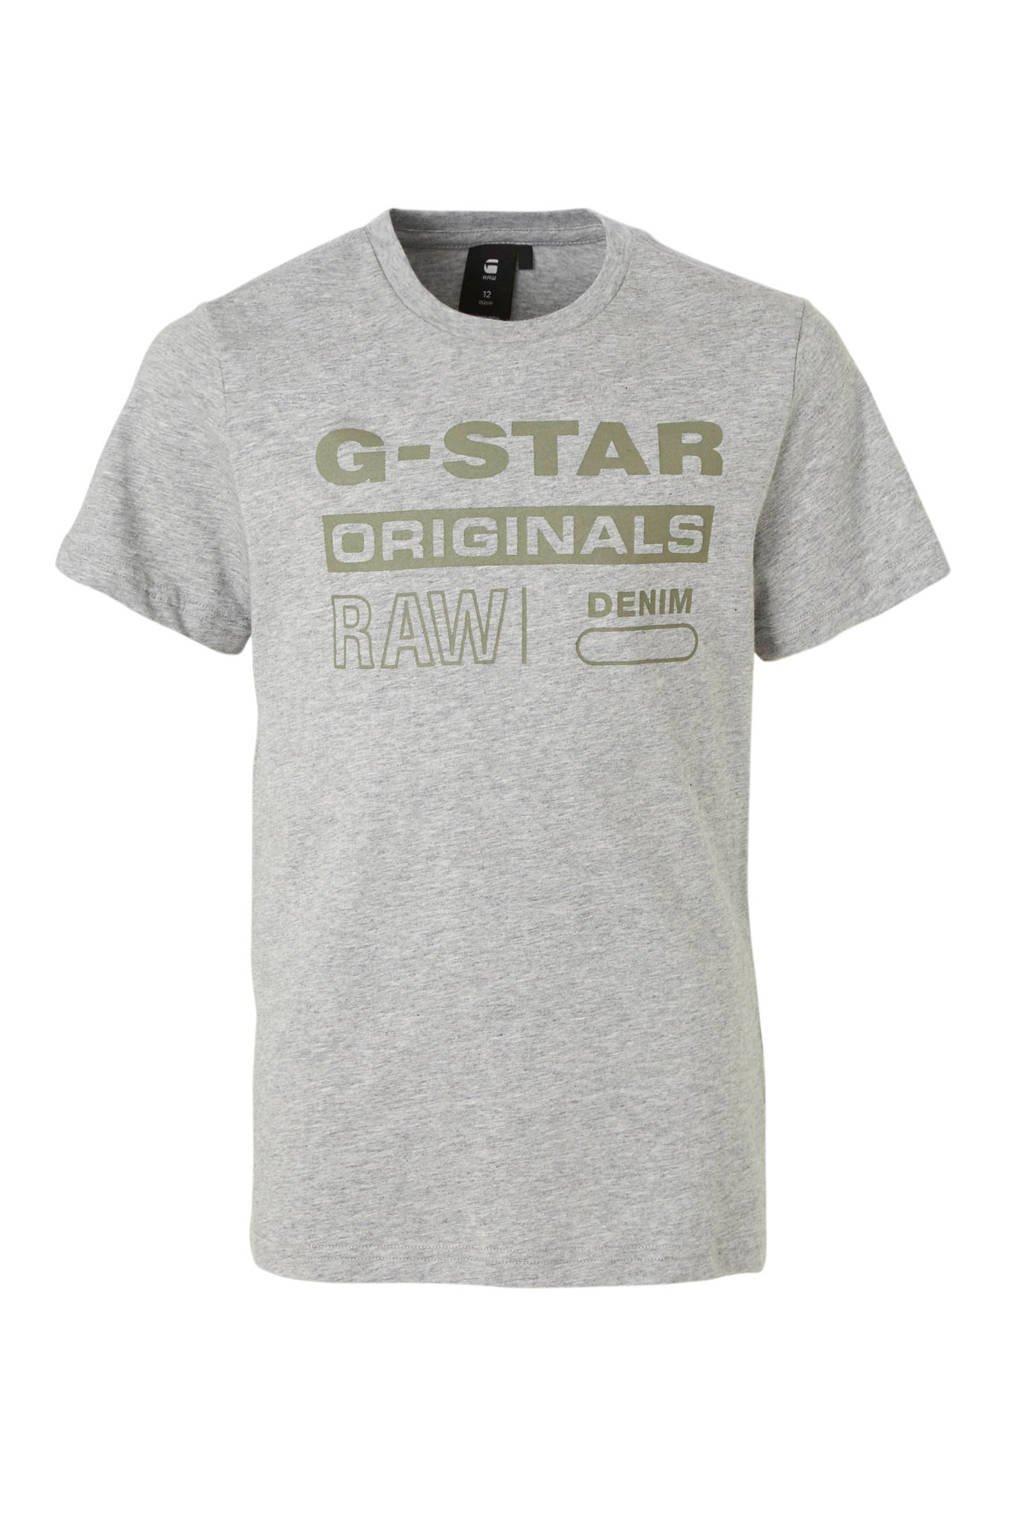 G-Star RAW T-shirt met logo grijs melange, Grijs melange